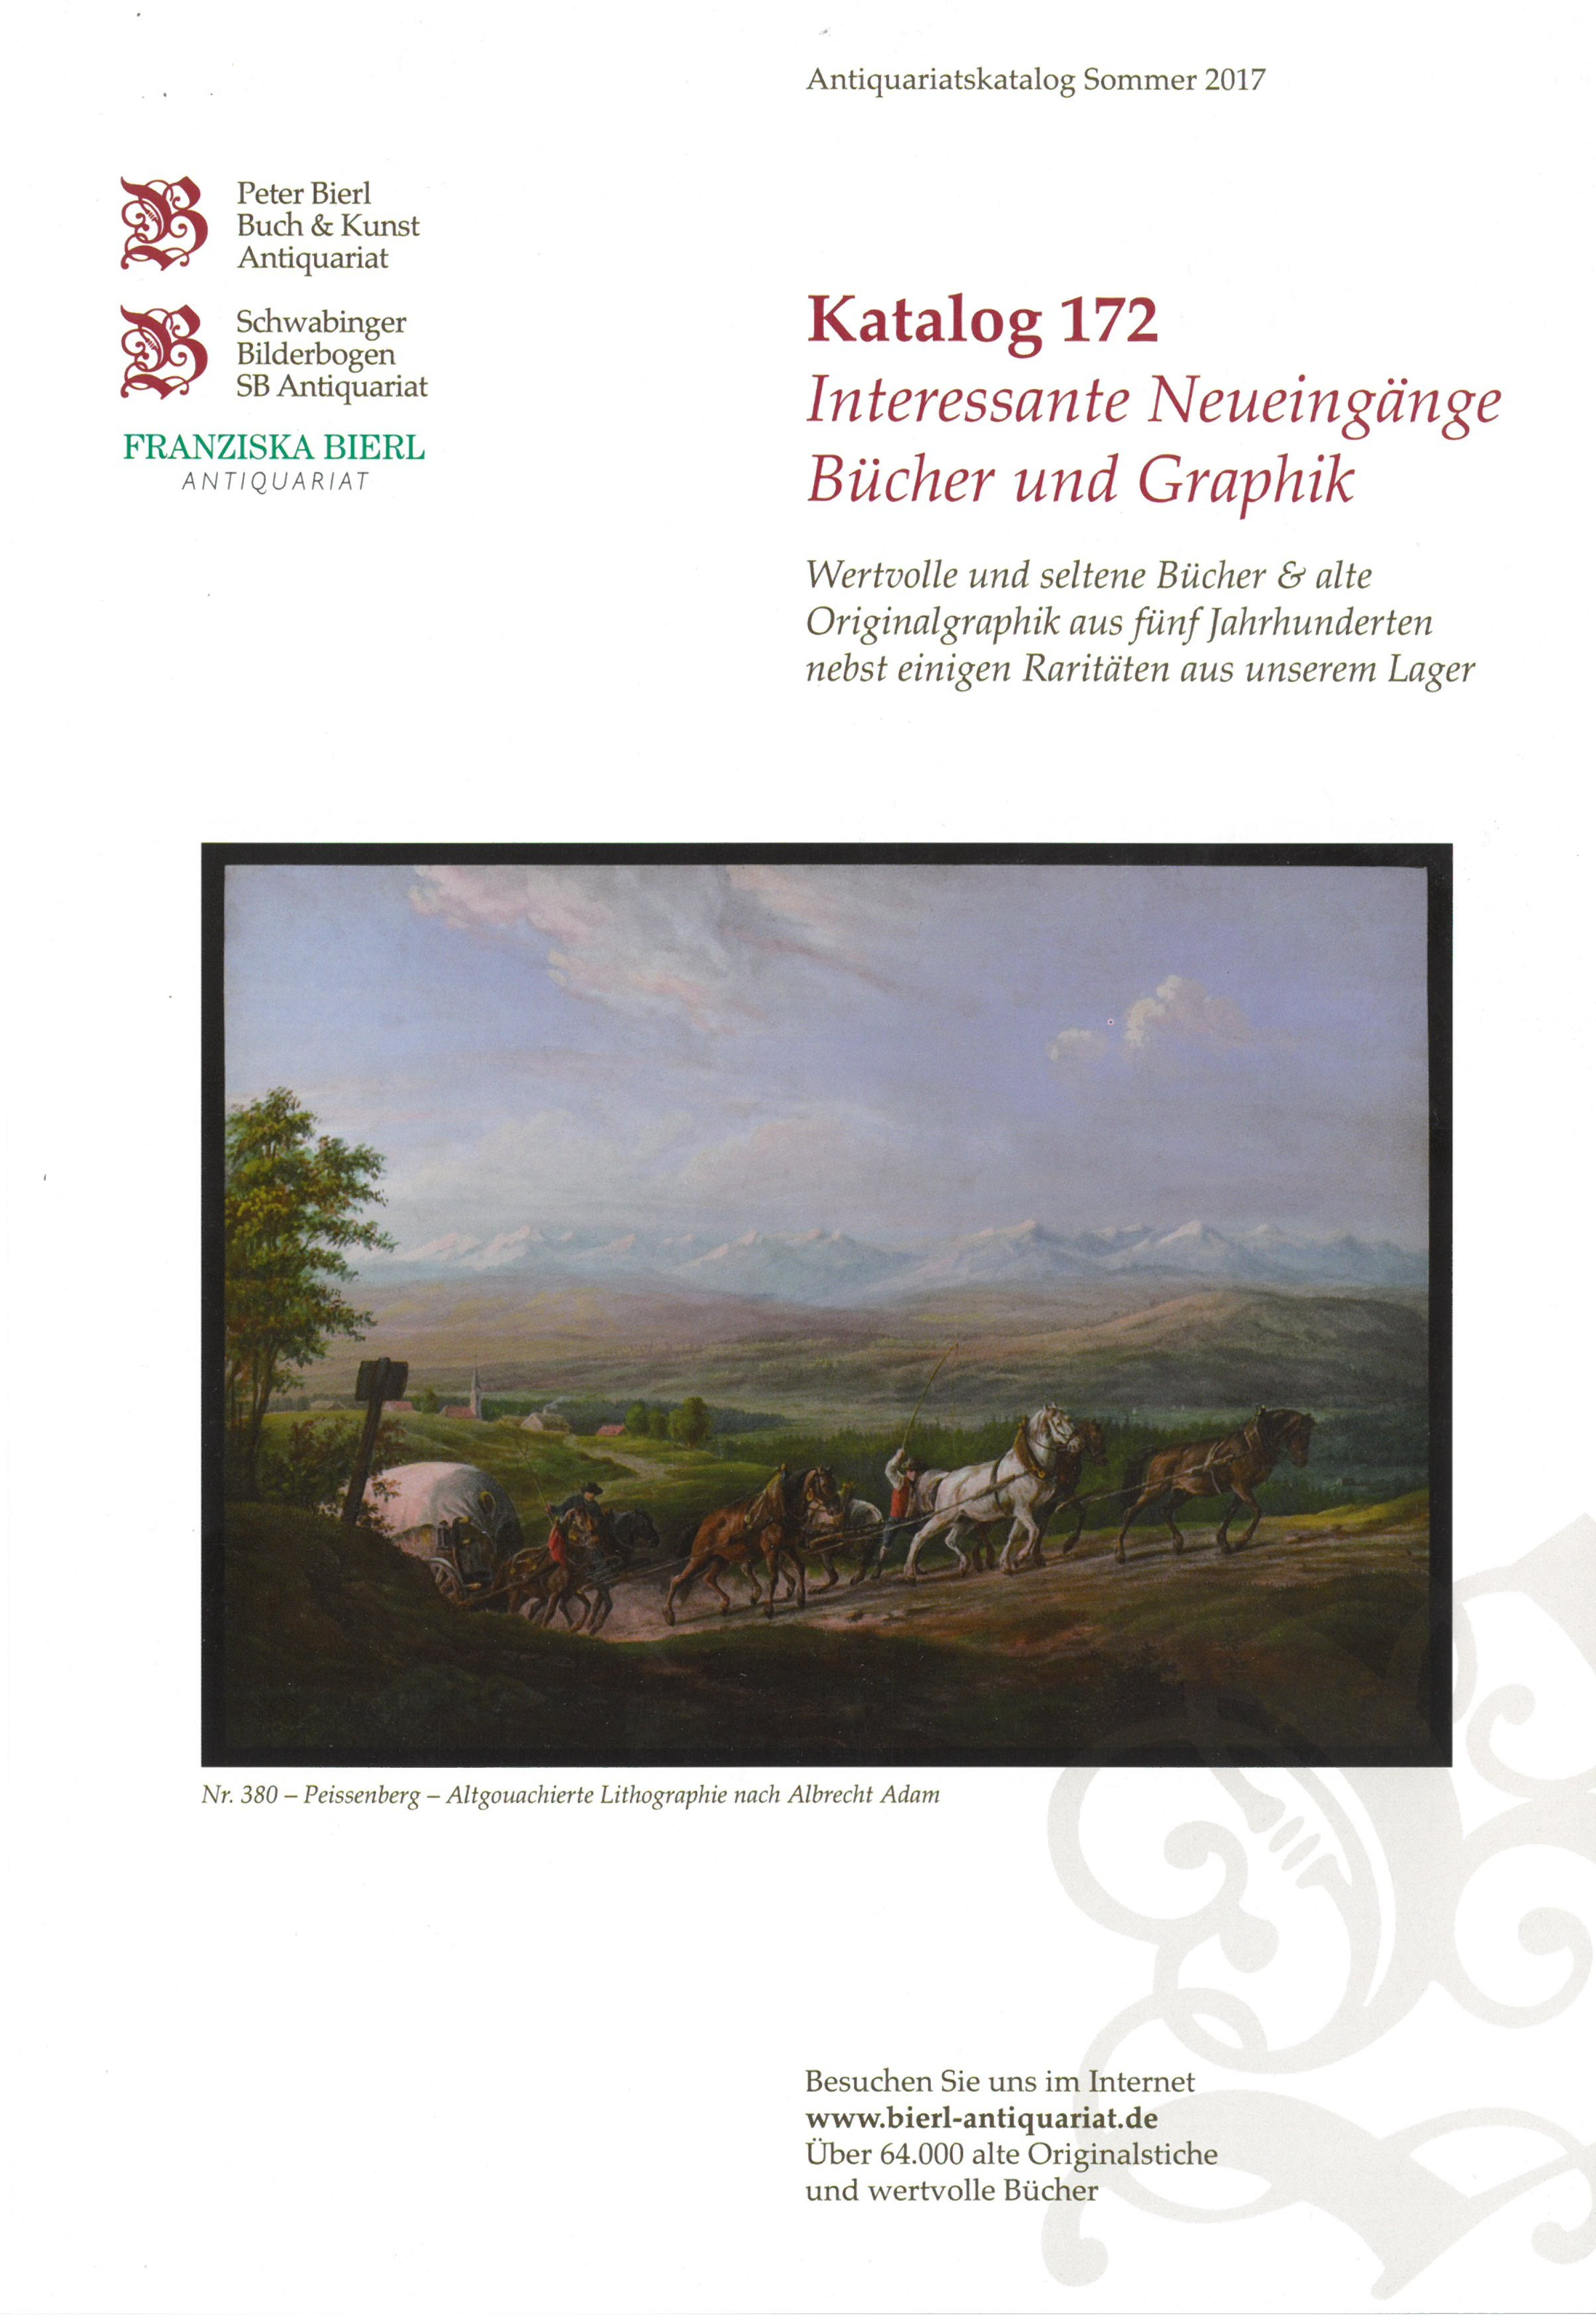 Katalog 172 - Interessante Neueingänge